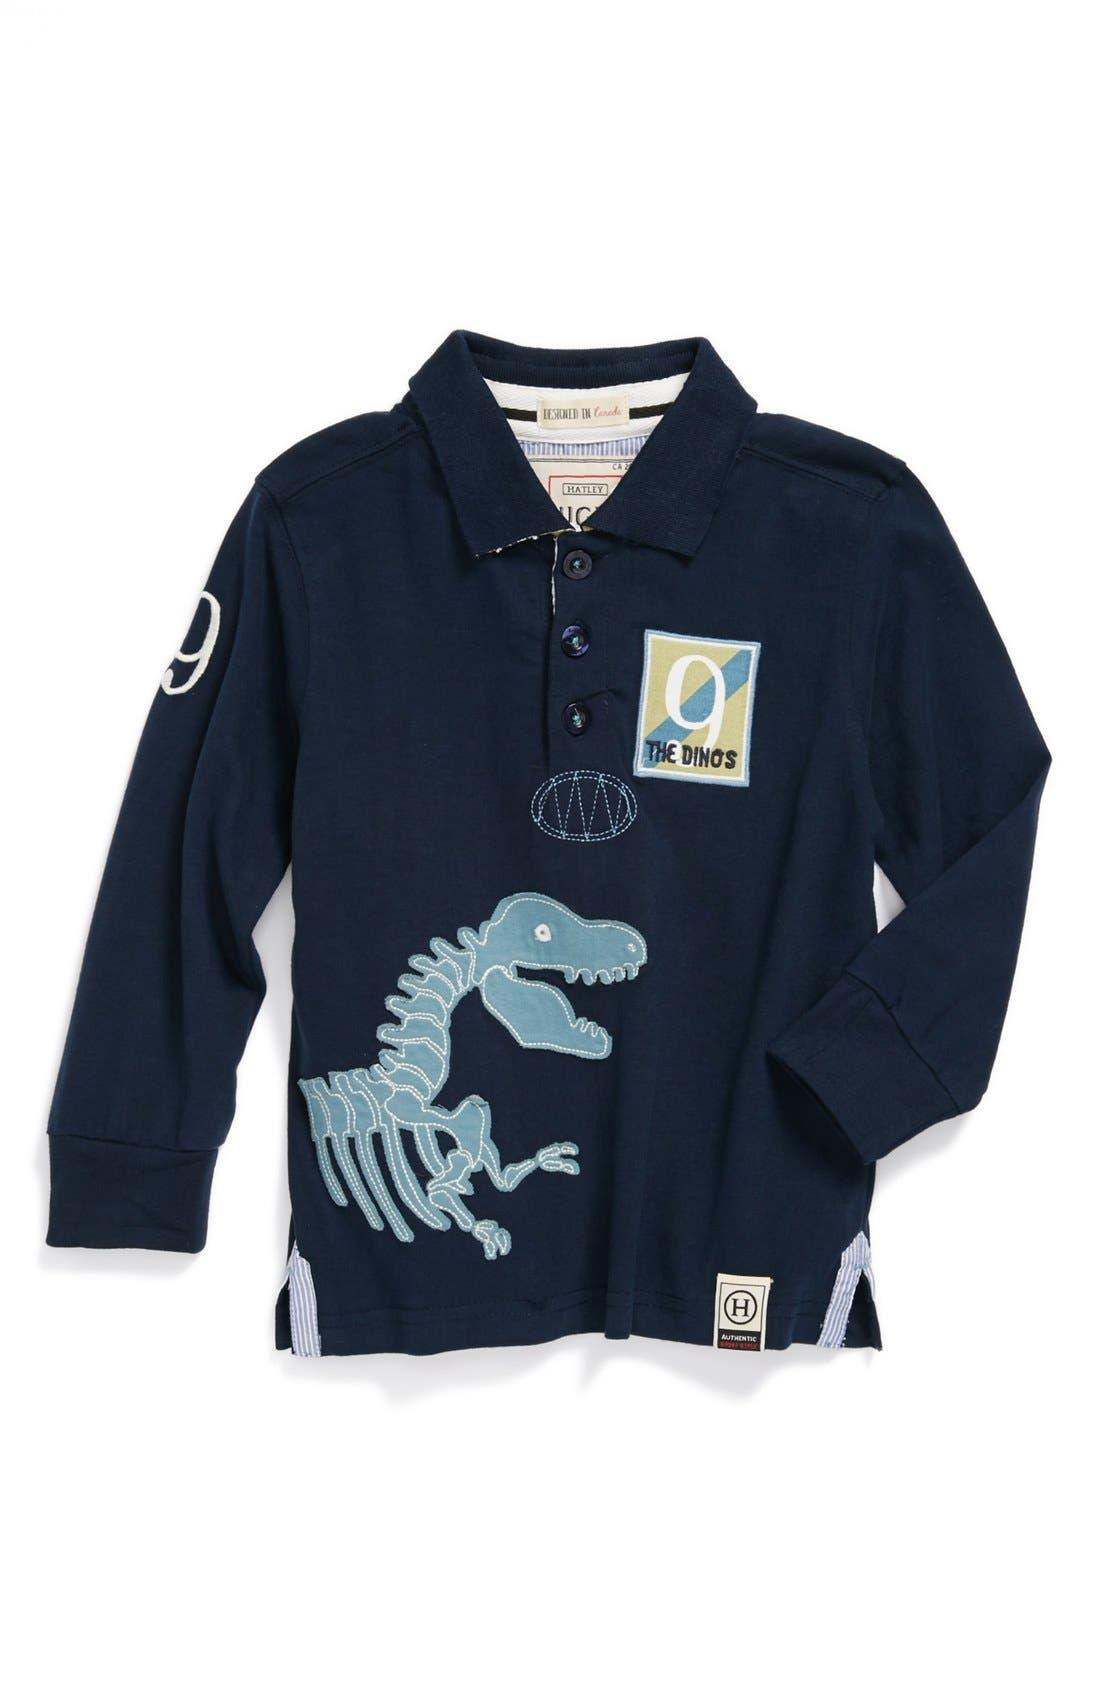 Main Image - Hatley 'Dino' Rugby Shirt (Toddler Boys)